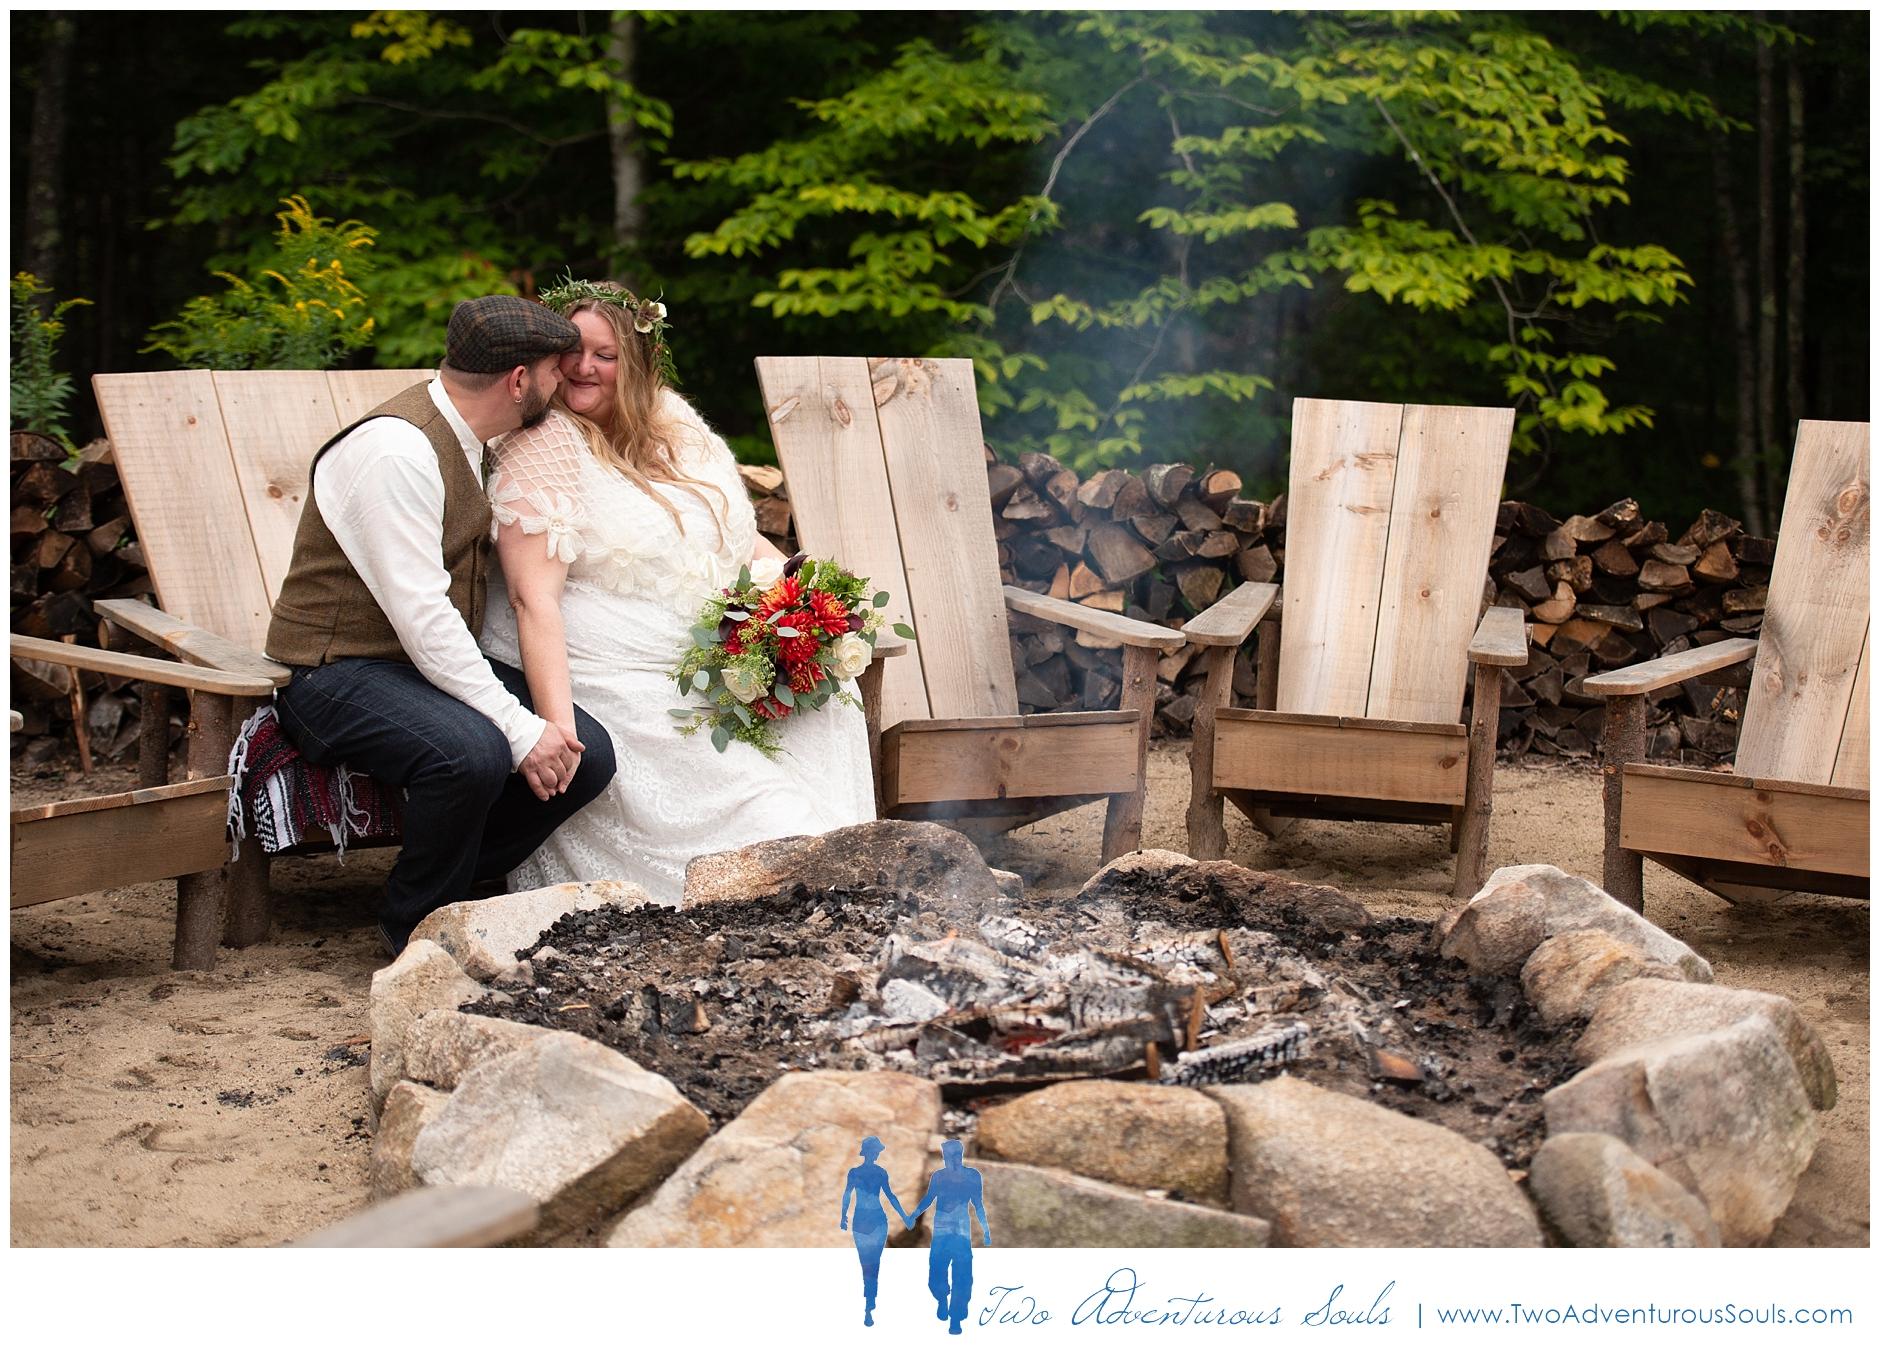 091218 - Chad & Kimmi - sneaks-35_Hidden Pond Wedding, Earth at Hidden Pond, Kennebunkport Wedding.jpg